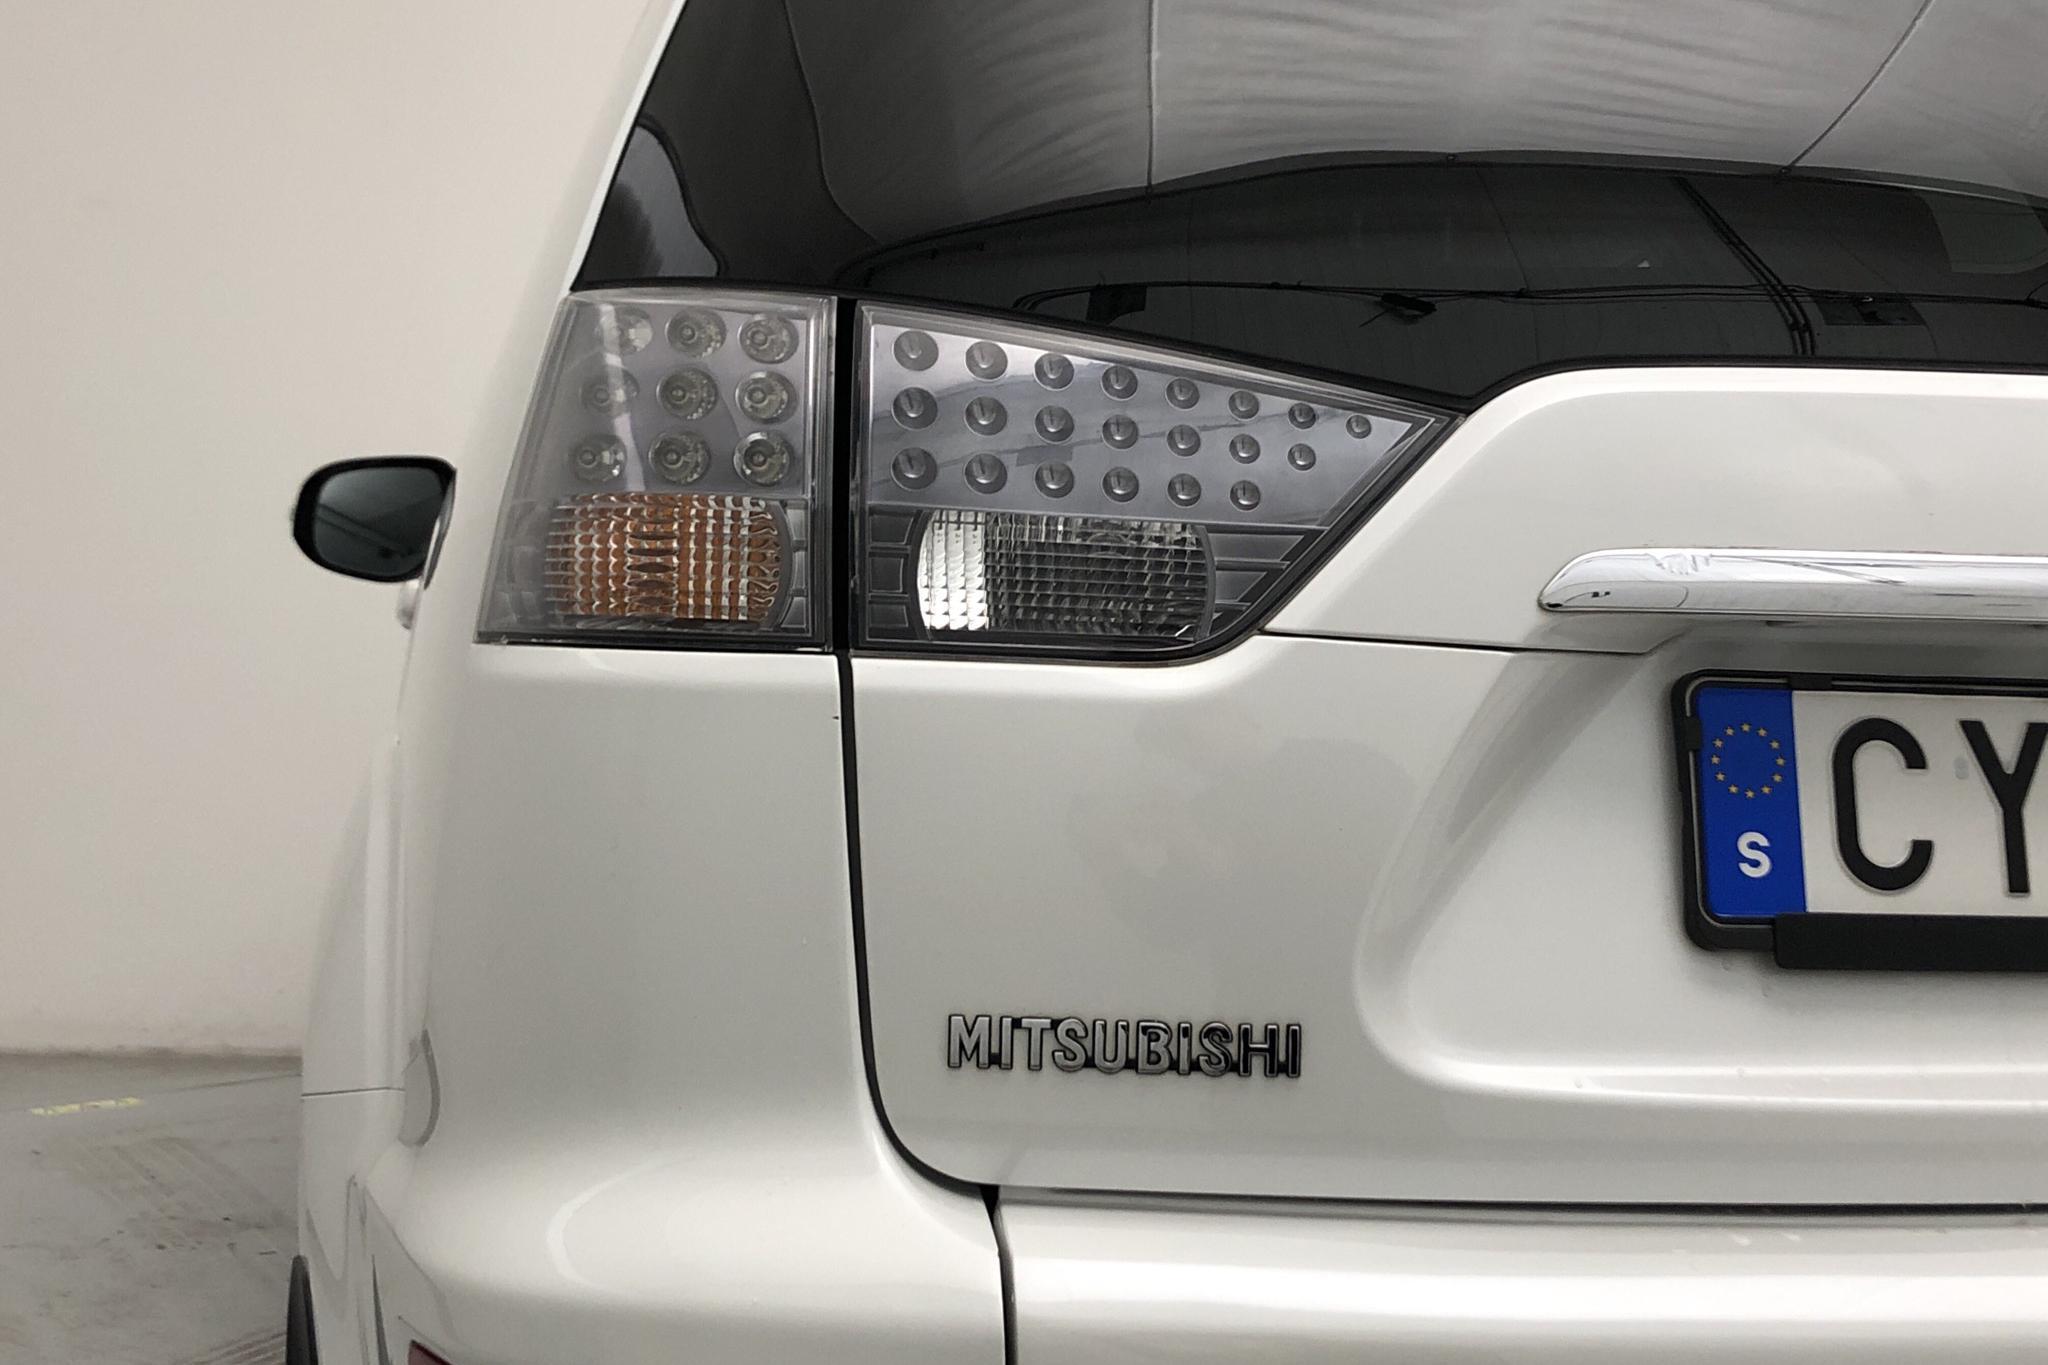 Mitsubishi Outlander 2.2 Di-D (156hk) - 12 842 mil - Automat - vit - 2012